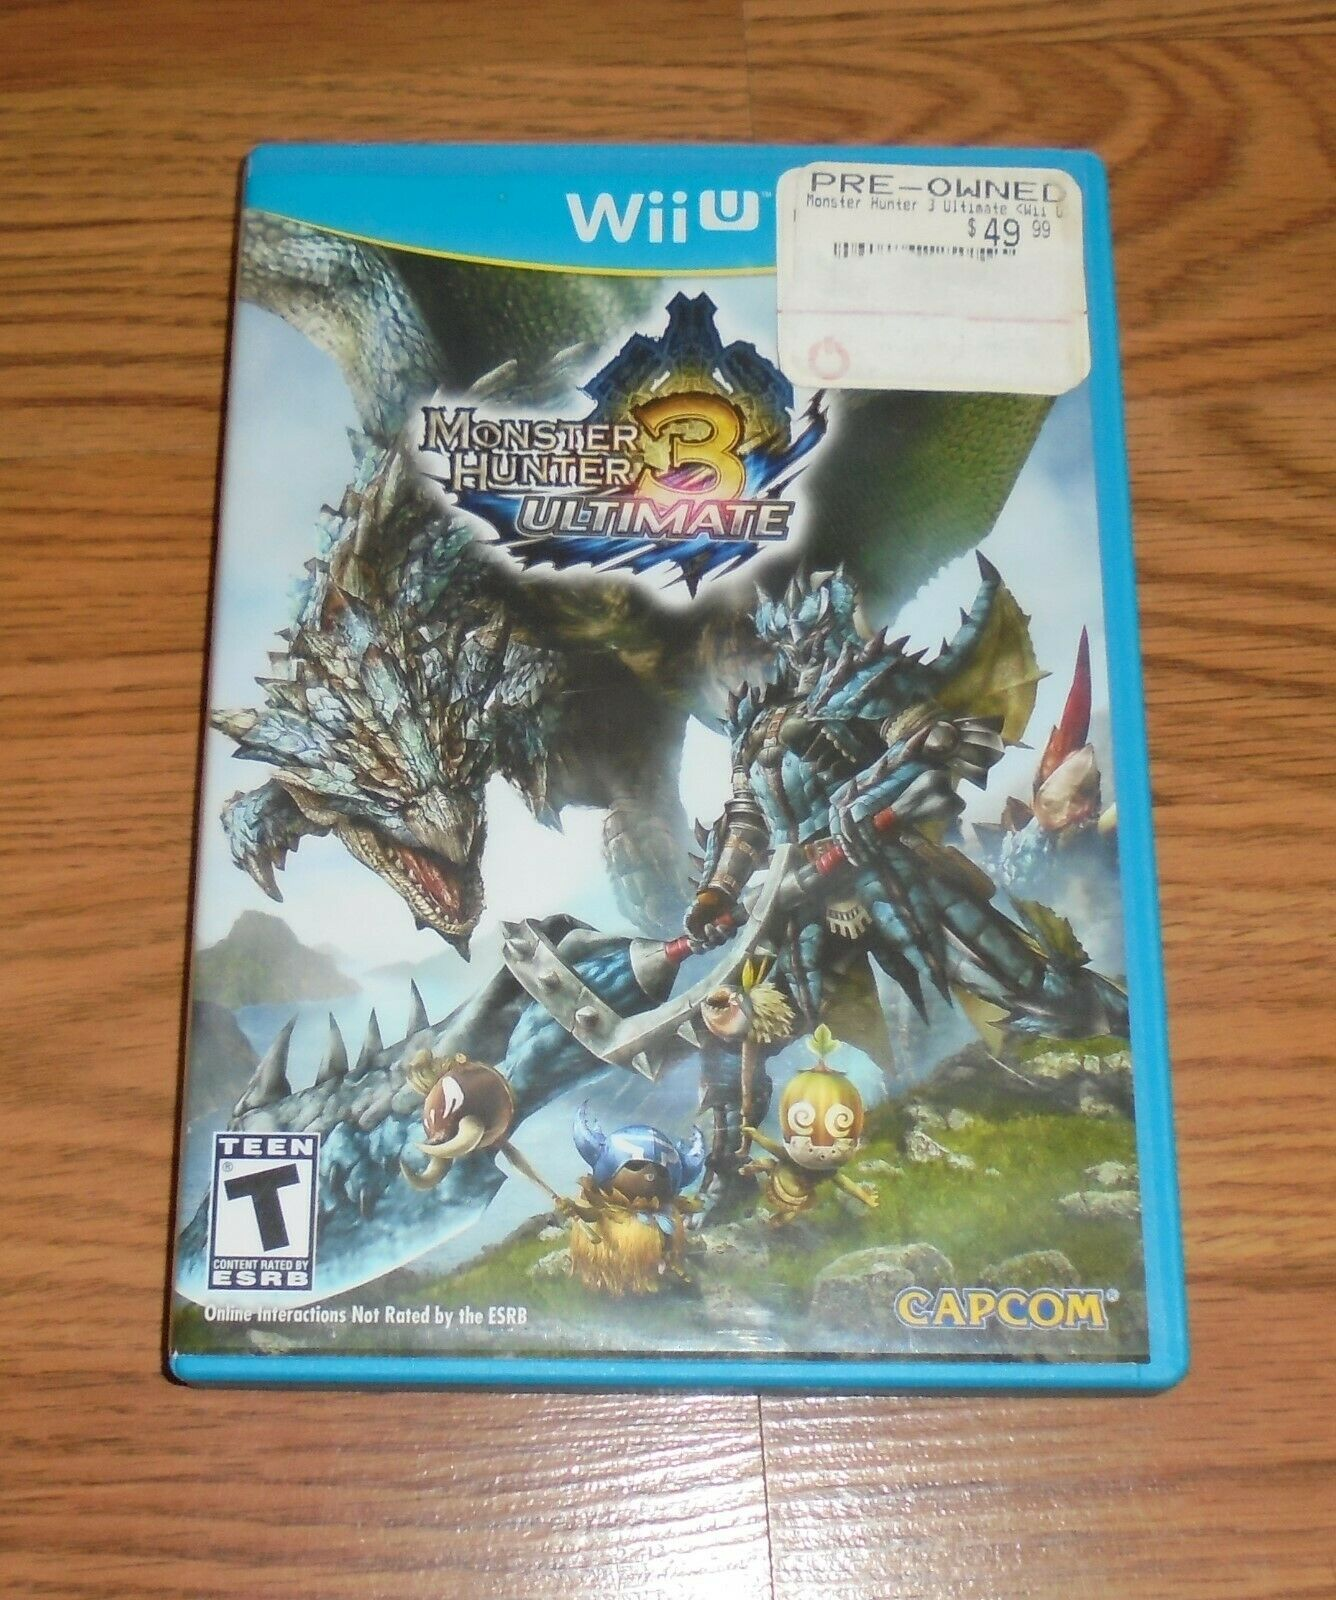 Monster Hunter 3 Ultimate (Nintendo Wii U, 2013) Complete Video Game